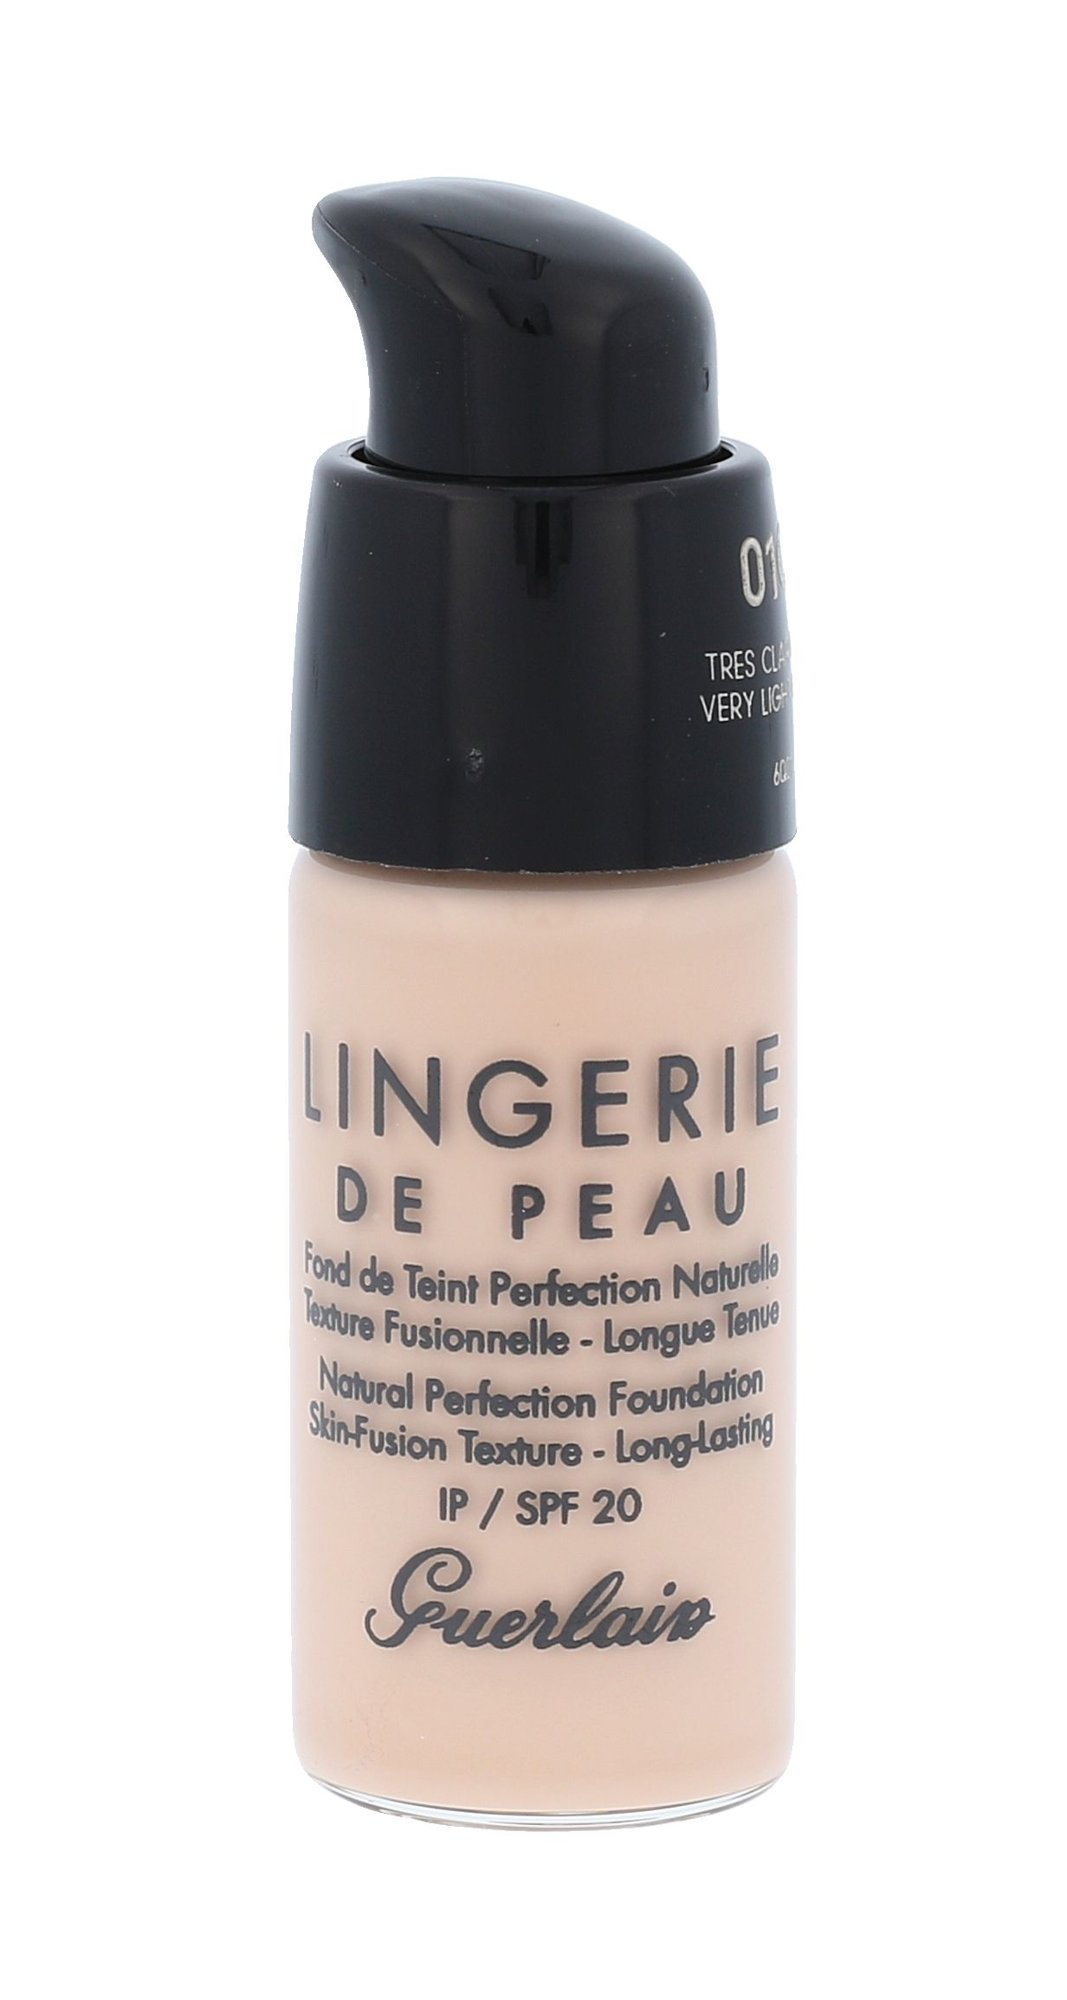 Guerlain Lingerie De Peau Cosmetic 15ml 01C Very Light Cool